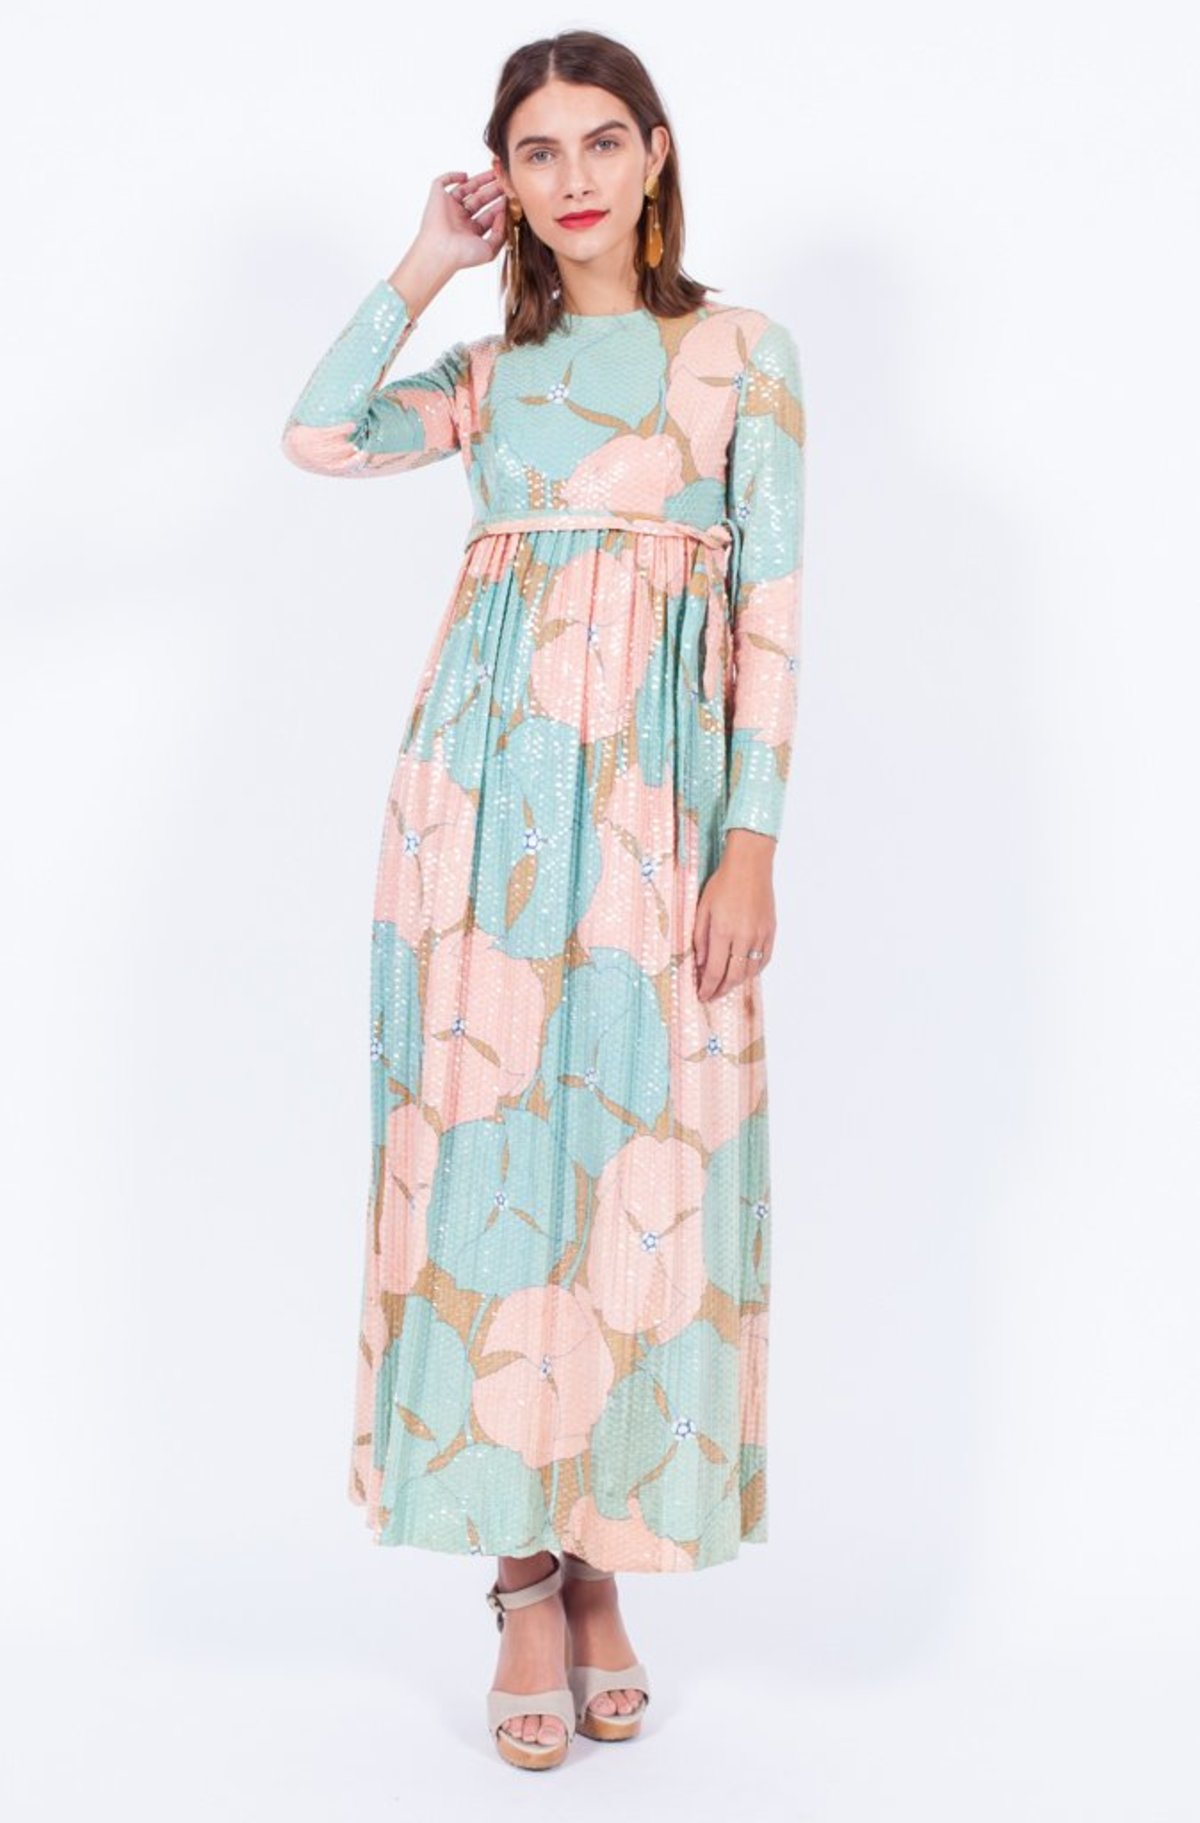 b23423b365 Yo Vintage! 1970s Pastel Sequin Dress - Small